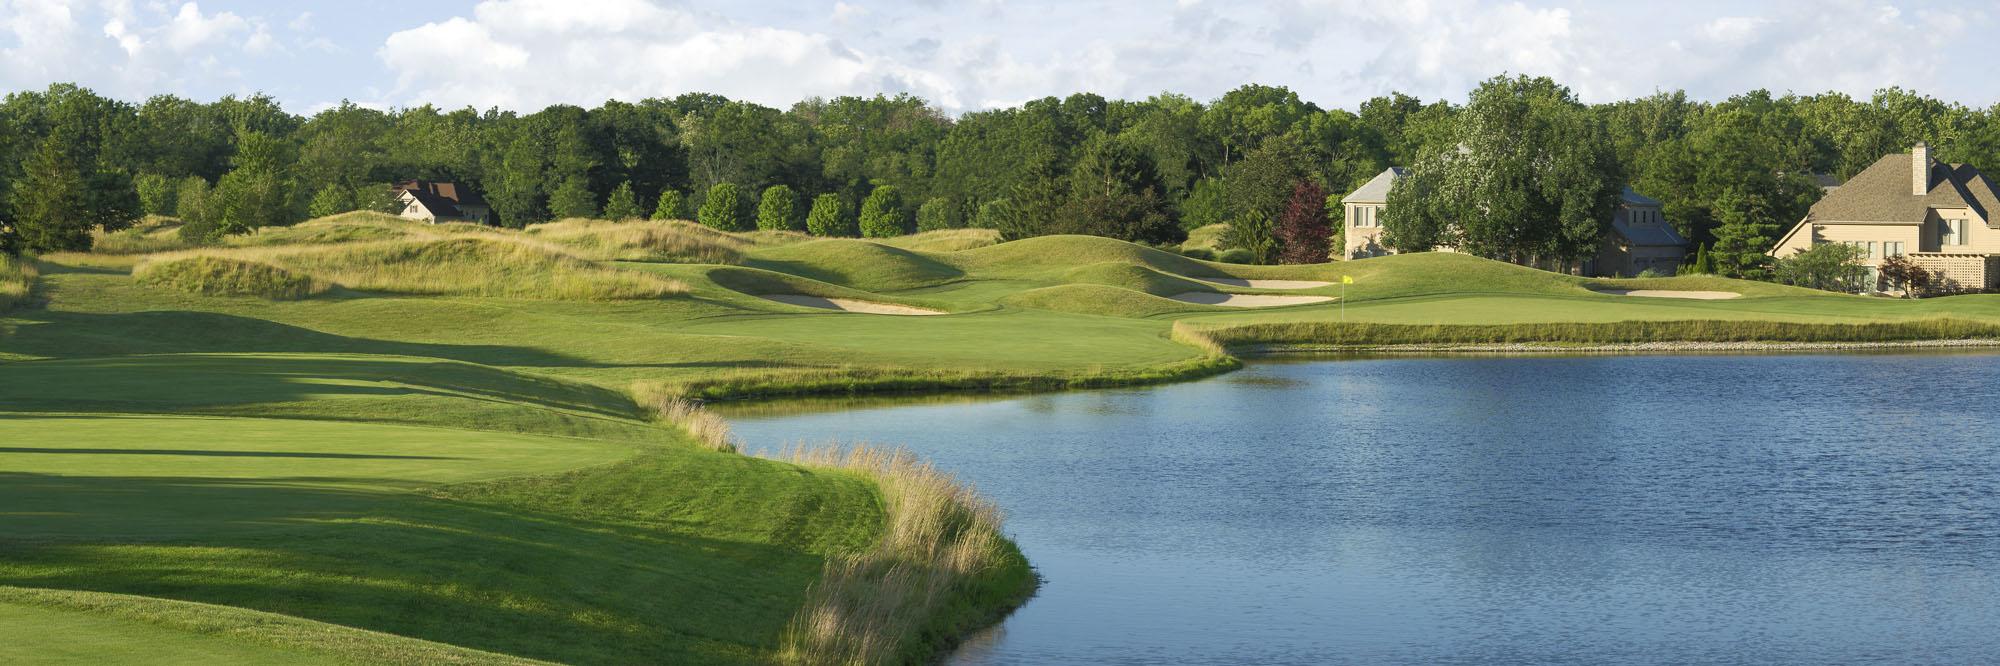 Golf Course Image - Jefferson Country Club No. 6